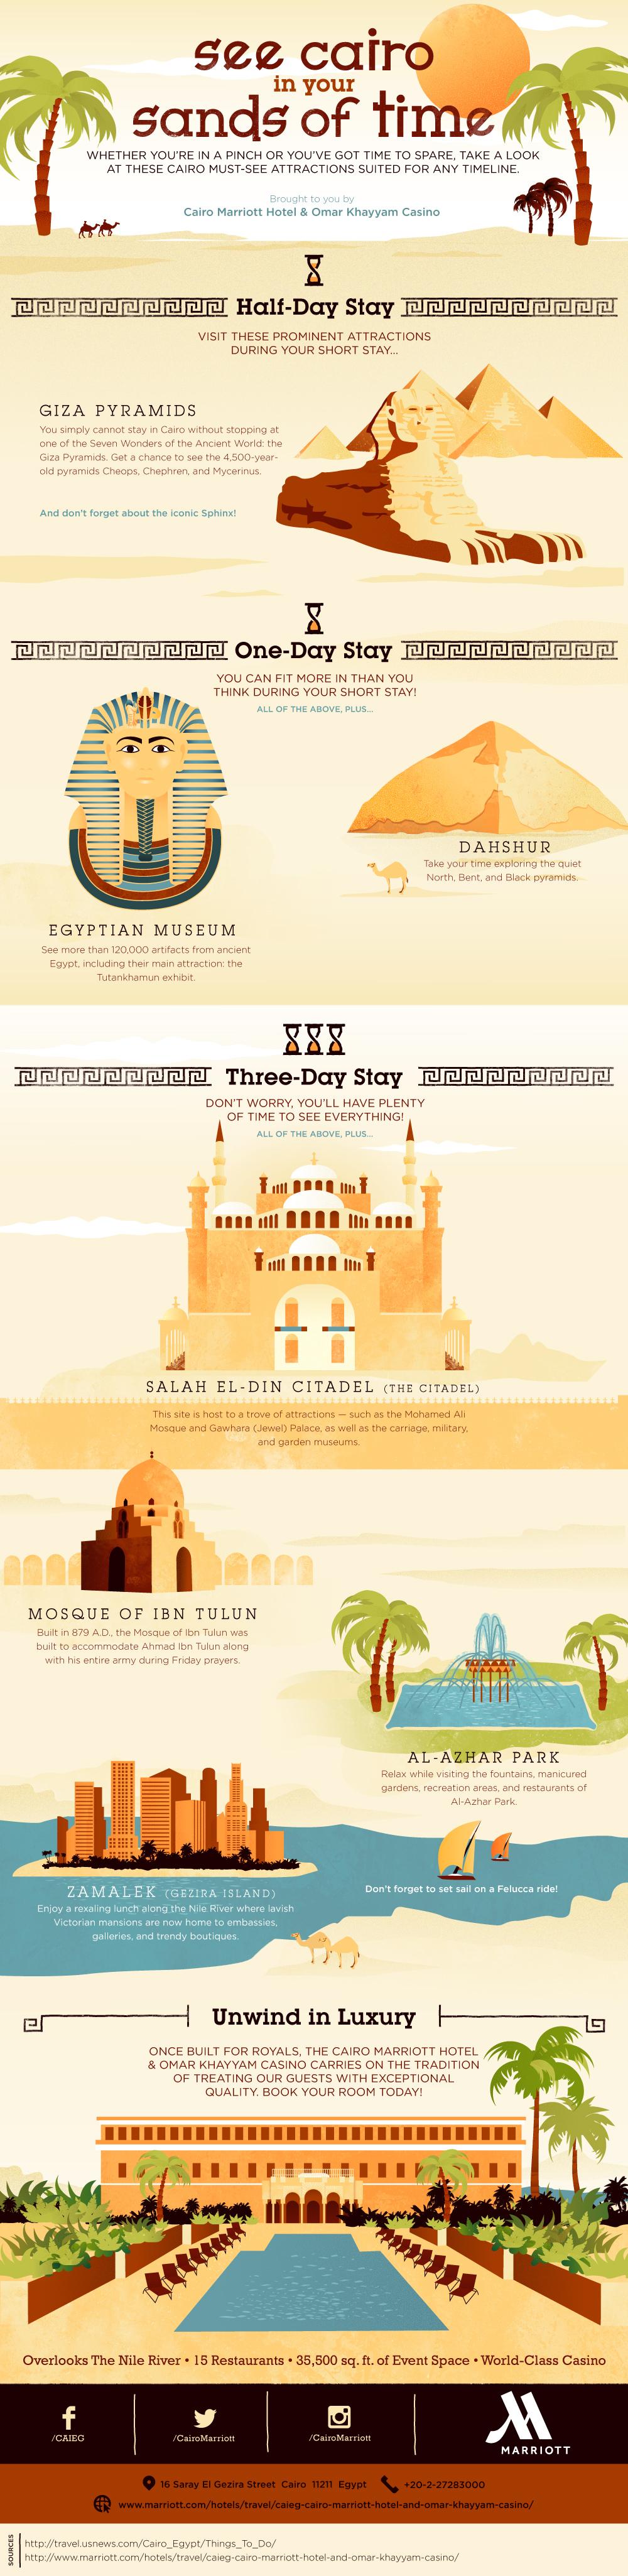 Famous Landmarks in Cairo